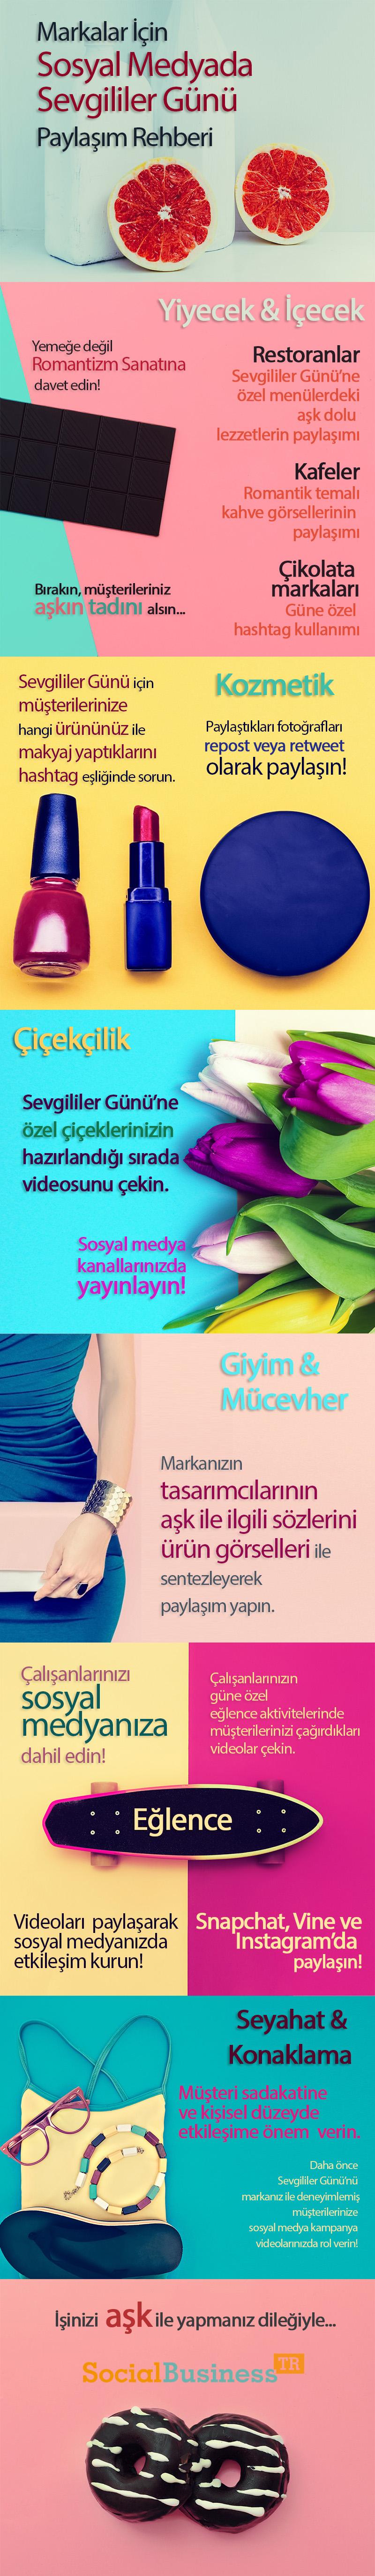 markalarin_sevgililer_gunu_paylasimlari